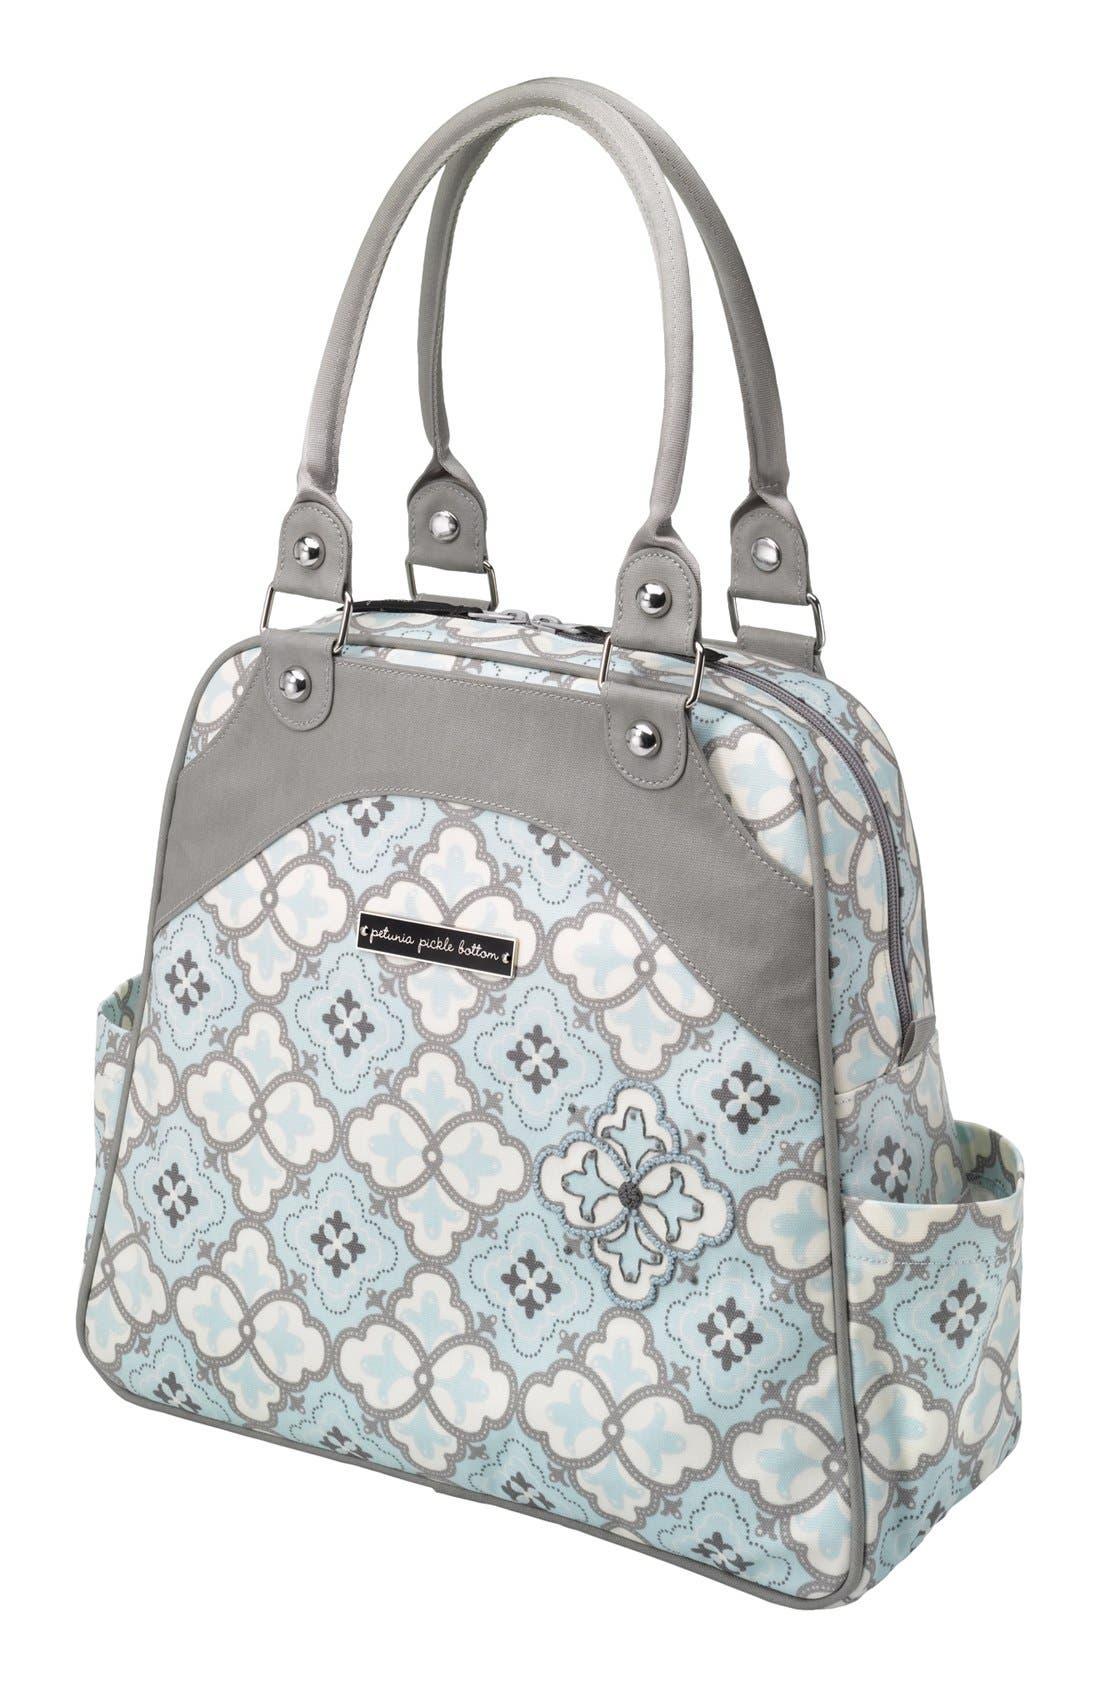 Main Image - Petunia Pickle Bottom 'Sashay Satchel' Glazed Diaper Bag